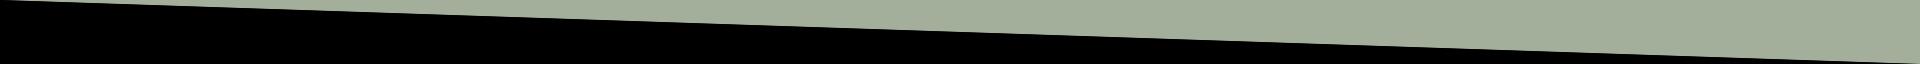 Heller – DBW Diagonaal